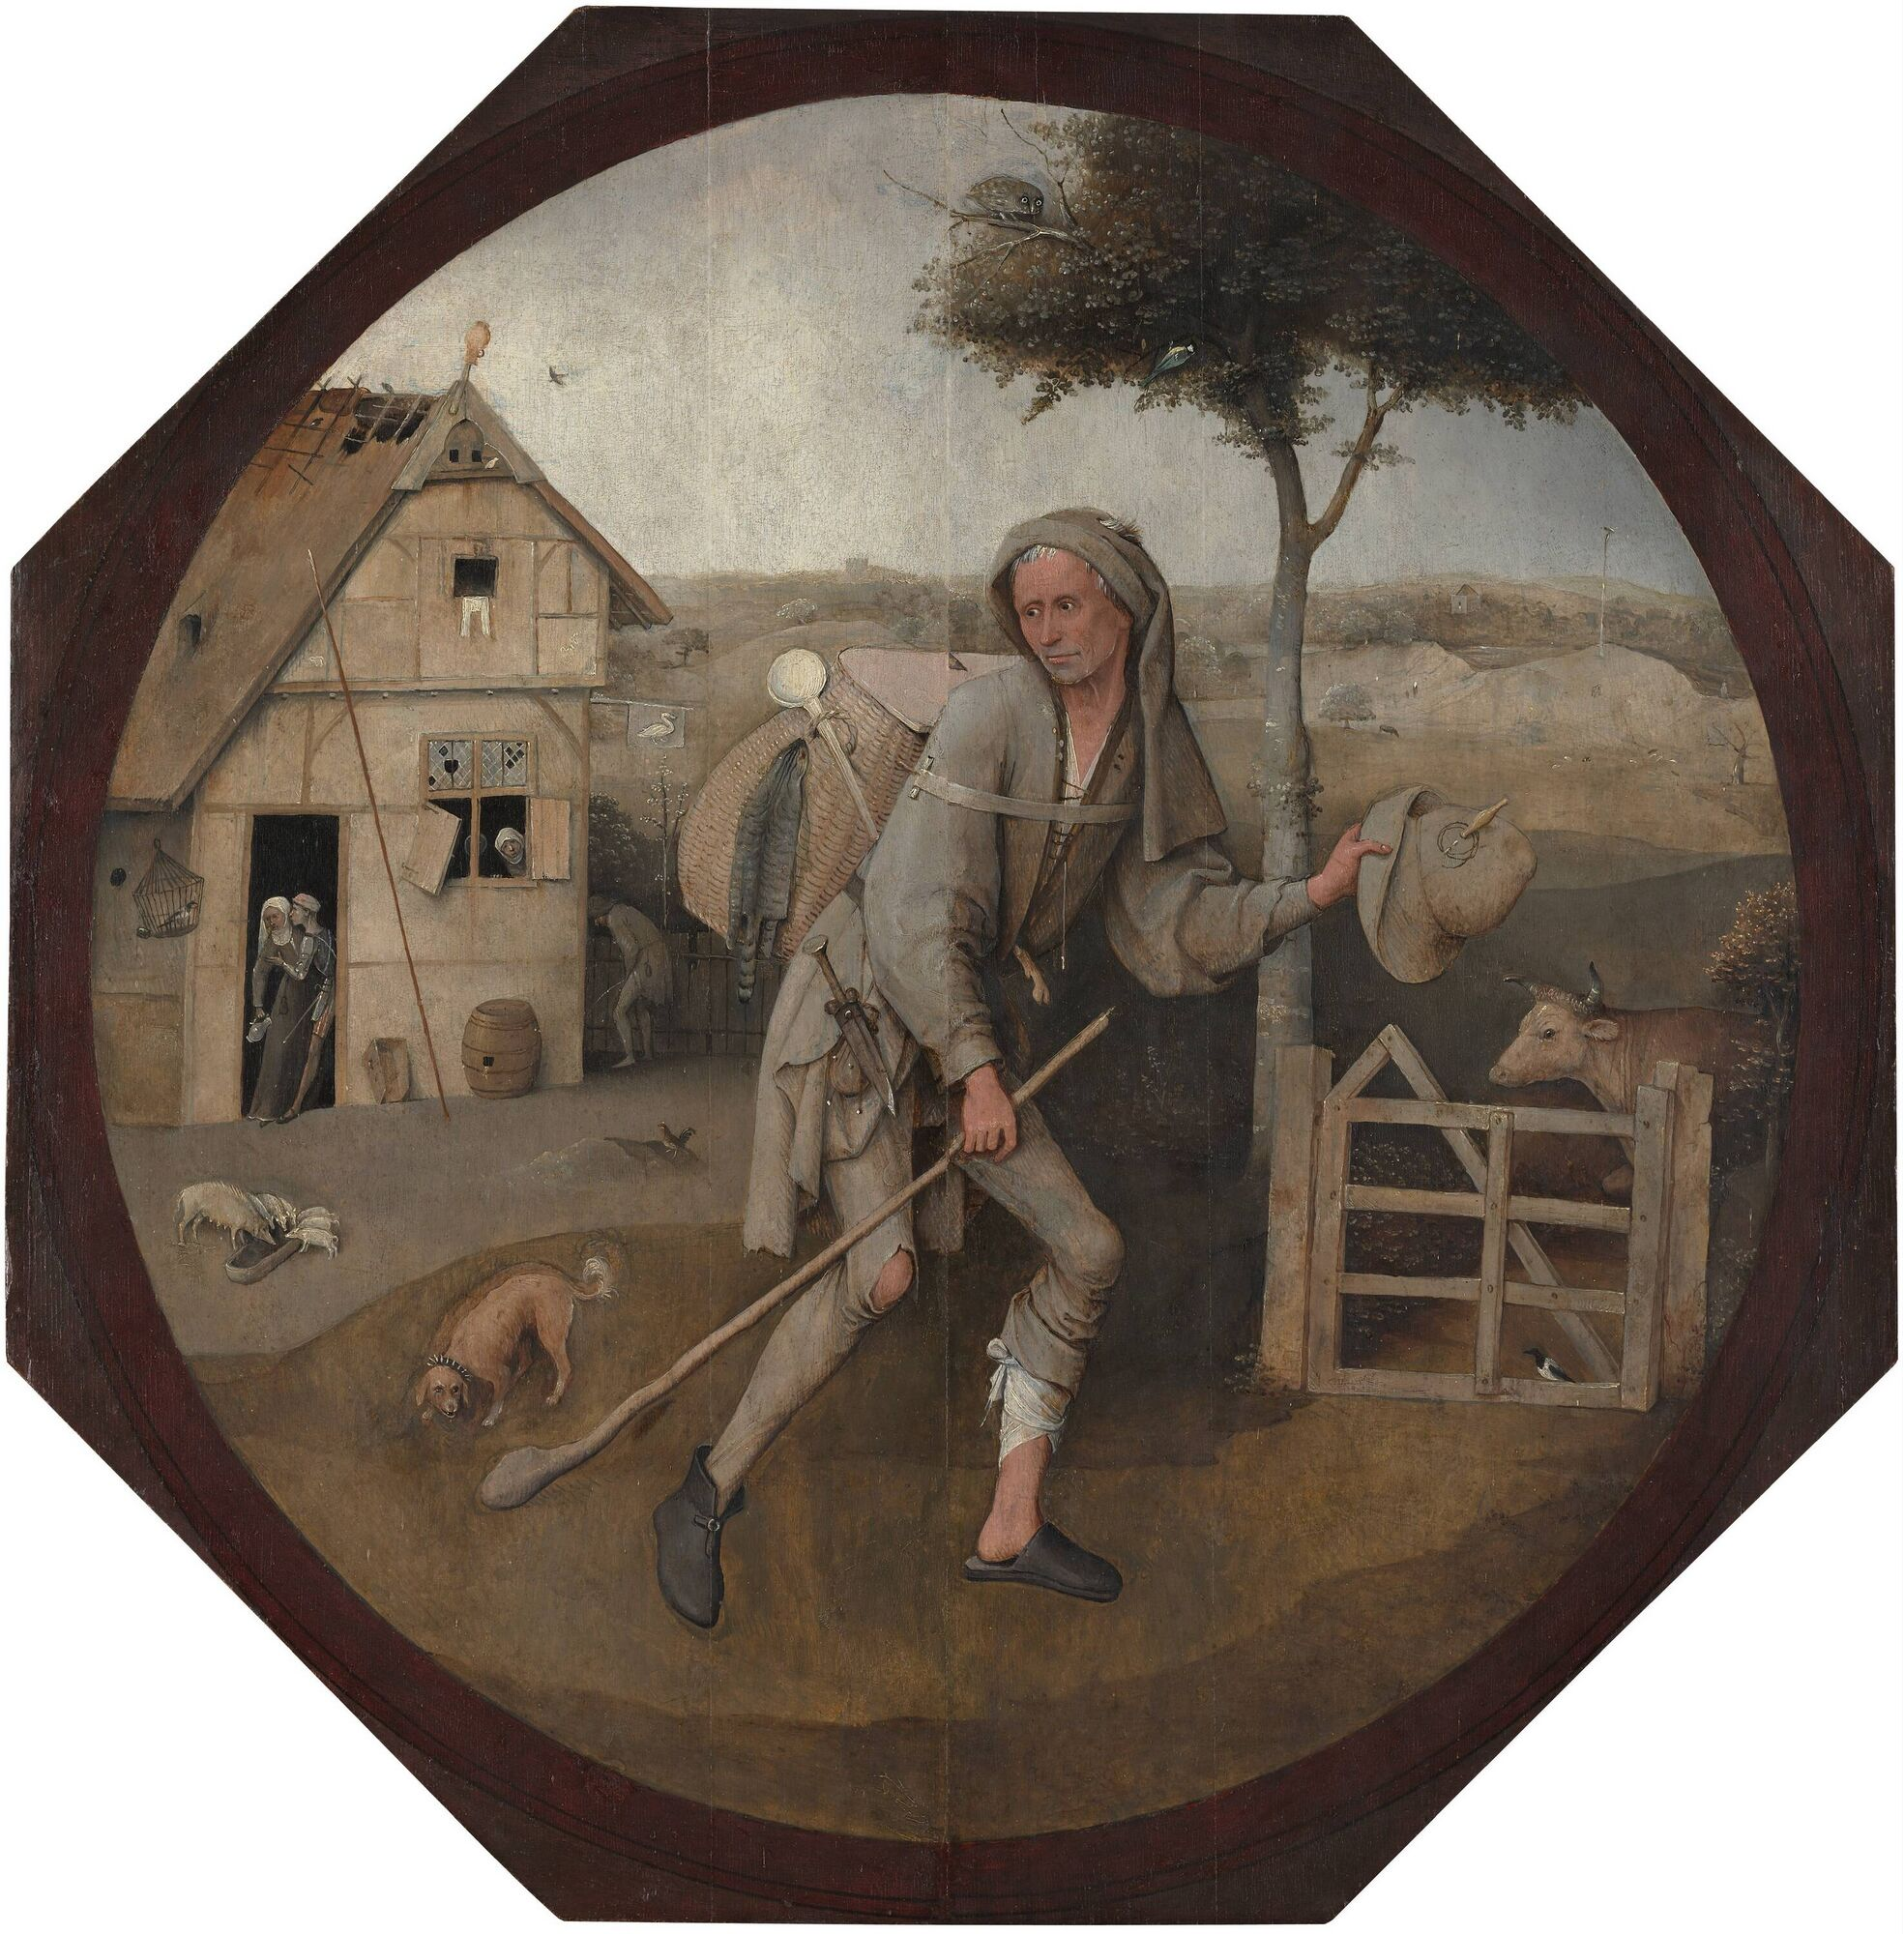 Bosch Le colporteur 1490-1510 Museum Boijmans Van Beuningen Rotterdam